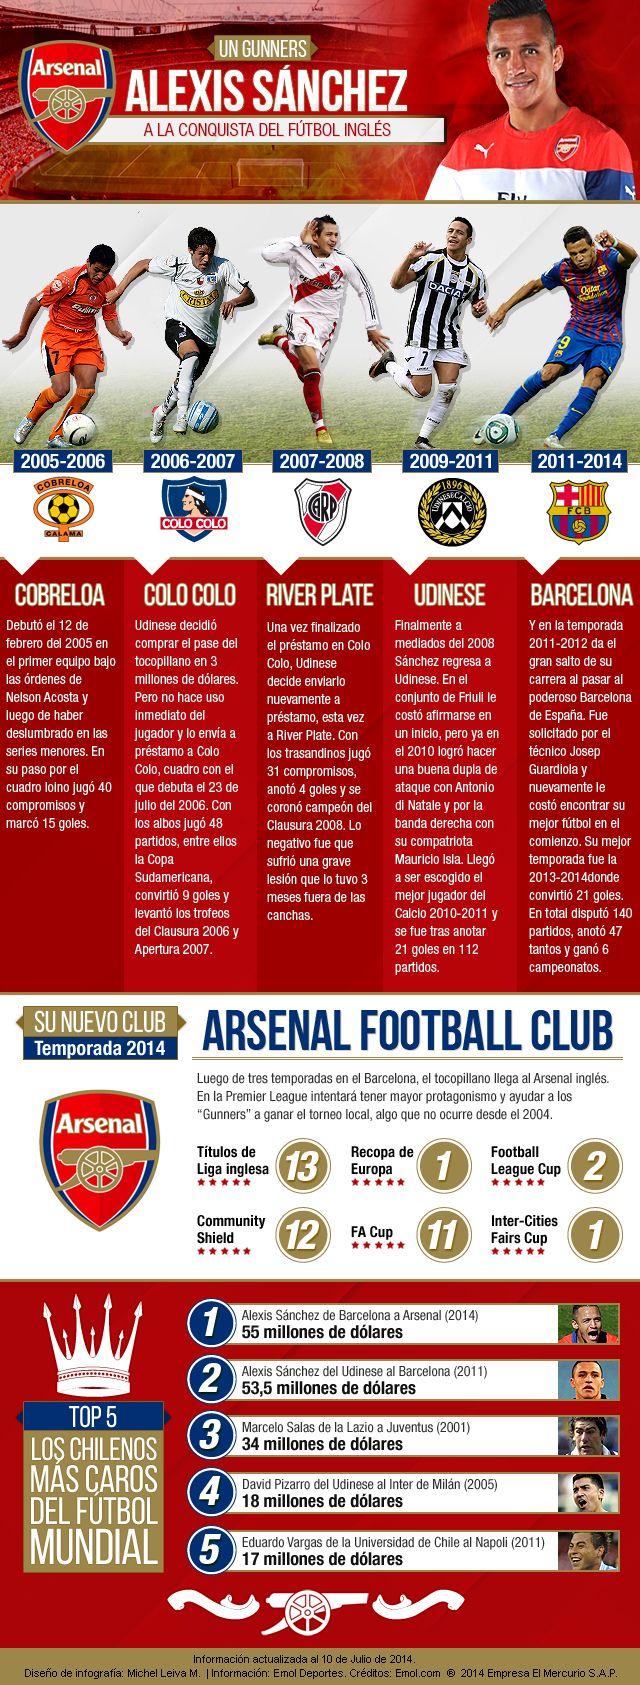 La carrera de Alexis Sanchez, desde Cobreloa al Arsenal inglés #PremierLeague #AlexisSanchez #Arsenal #Gunners #Barcelona #Barca #Chile - Arsenal FC - Gunners - Udinese - Barcelona